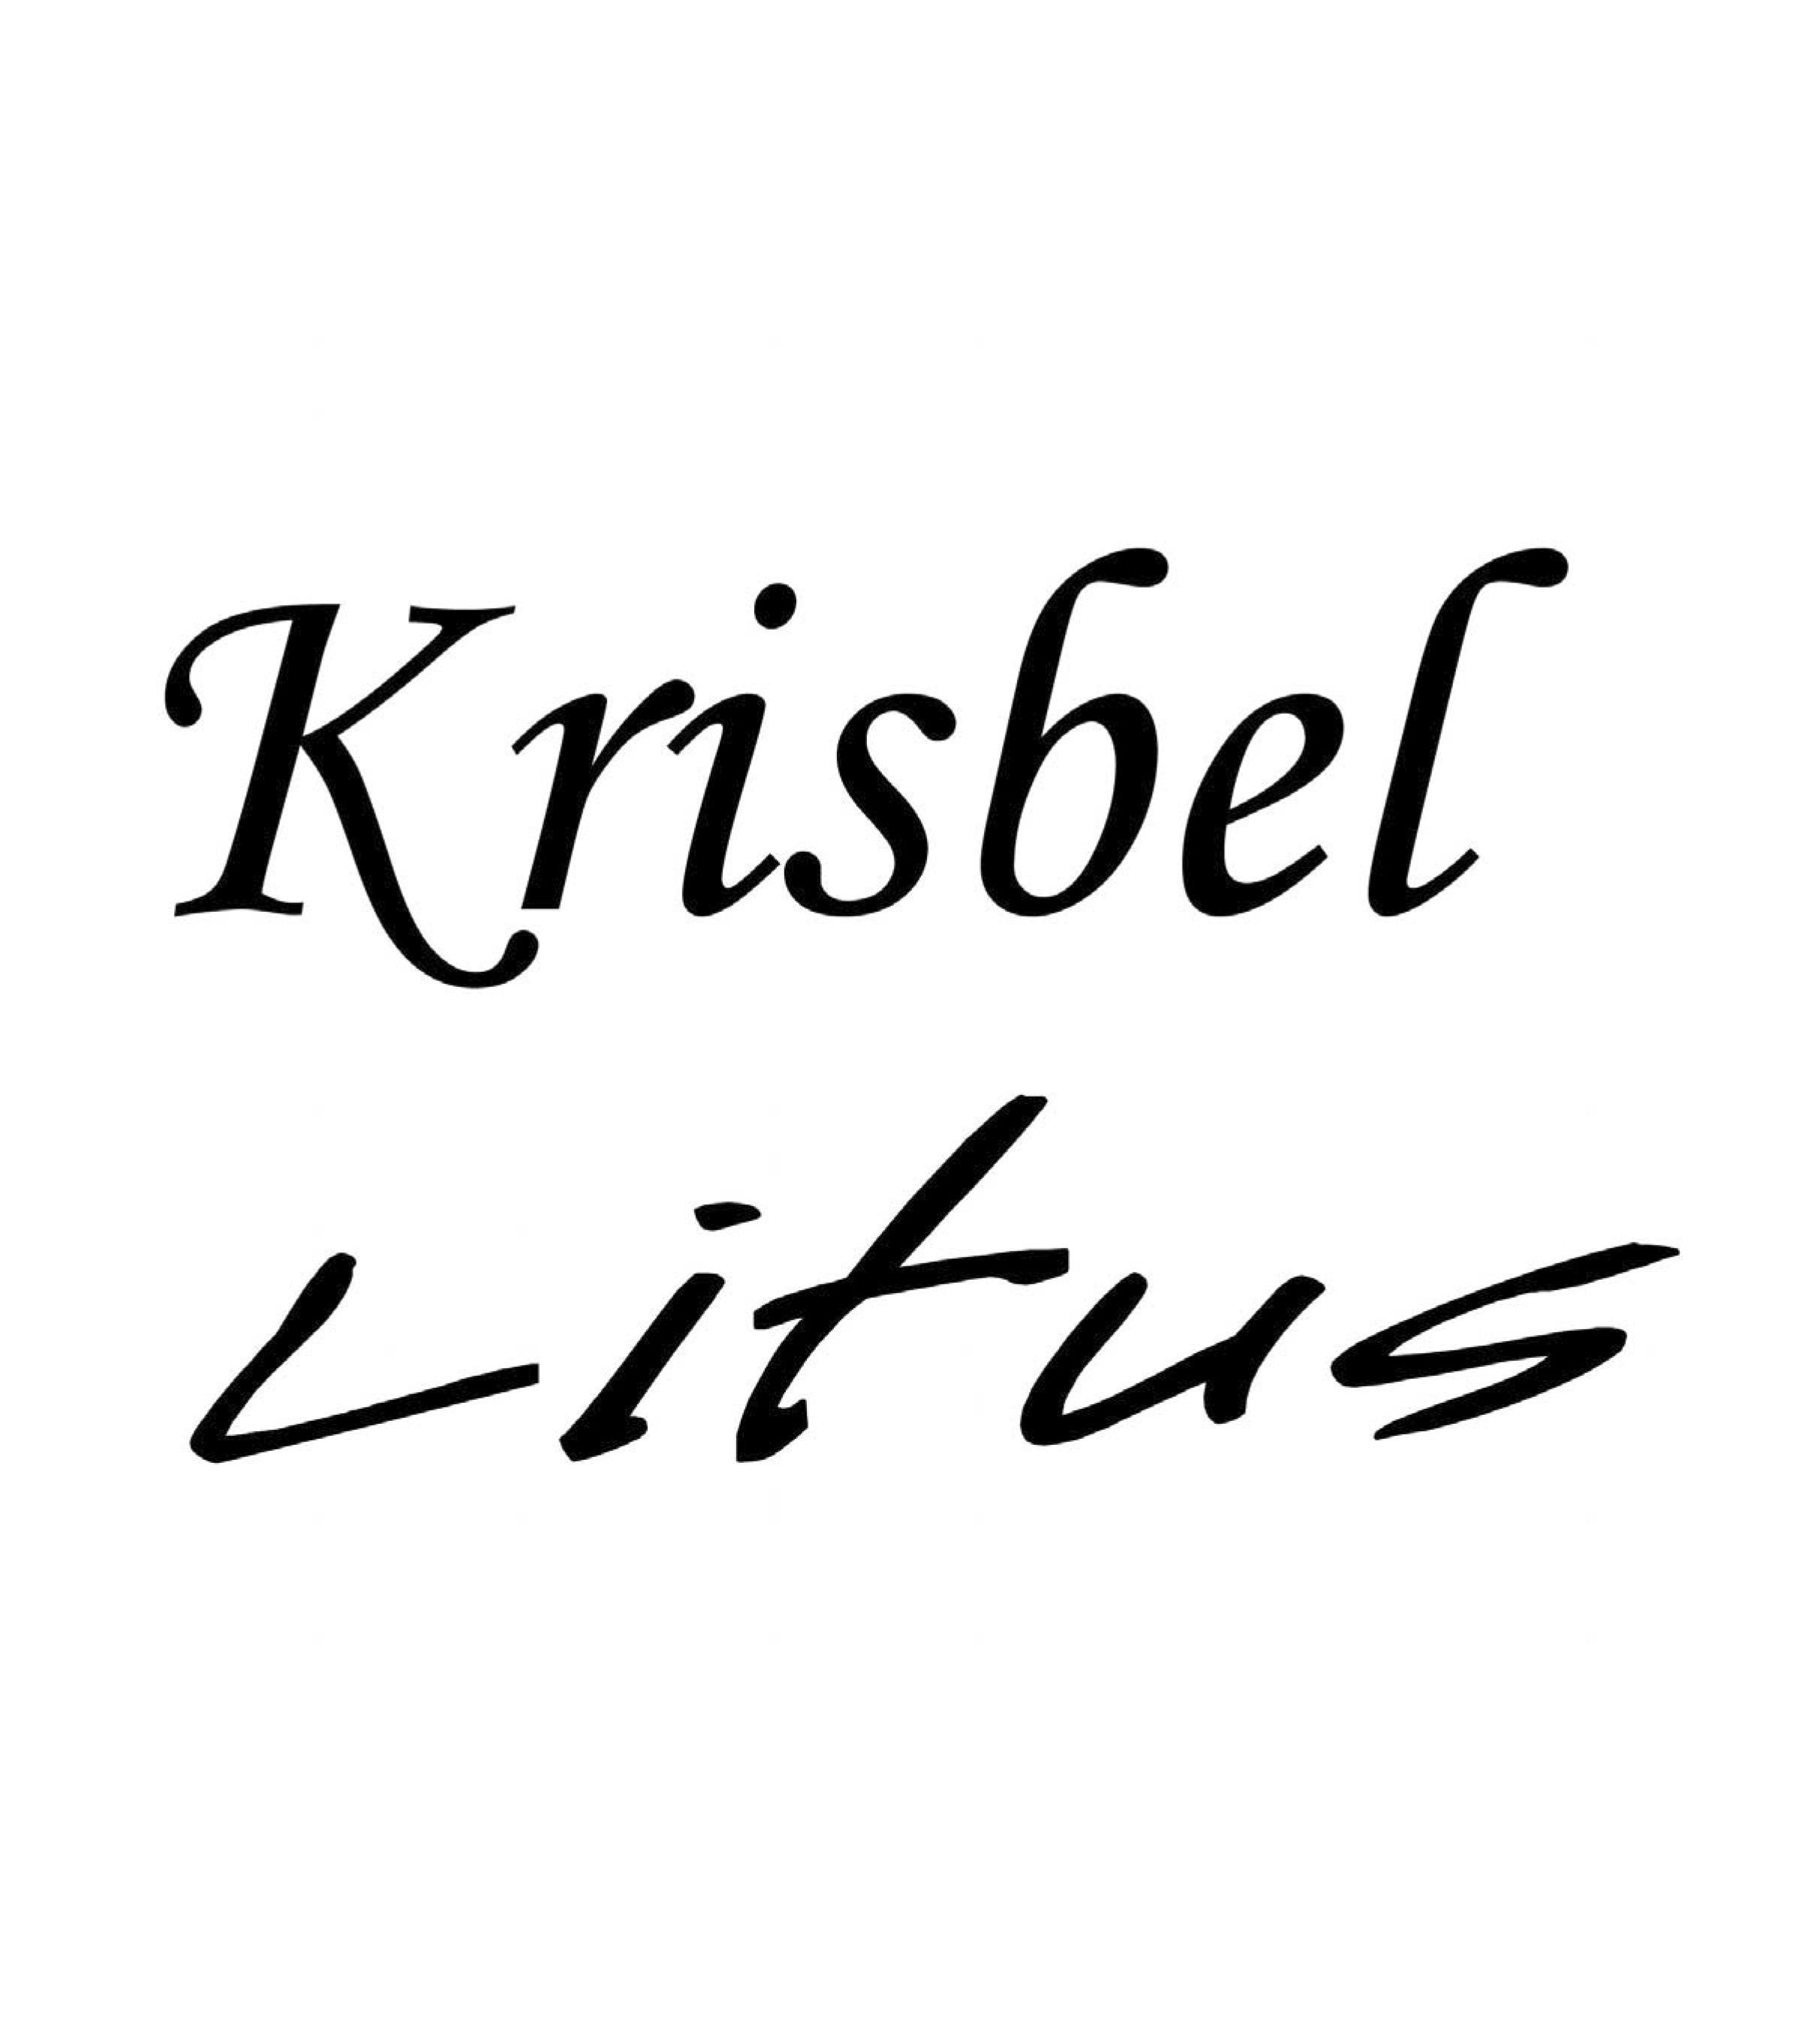 KRISBEL LITUS